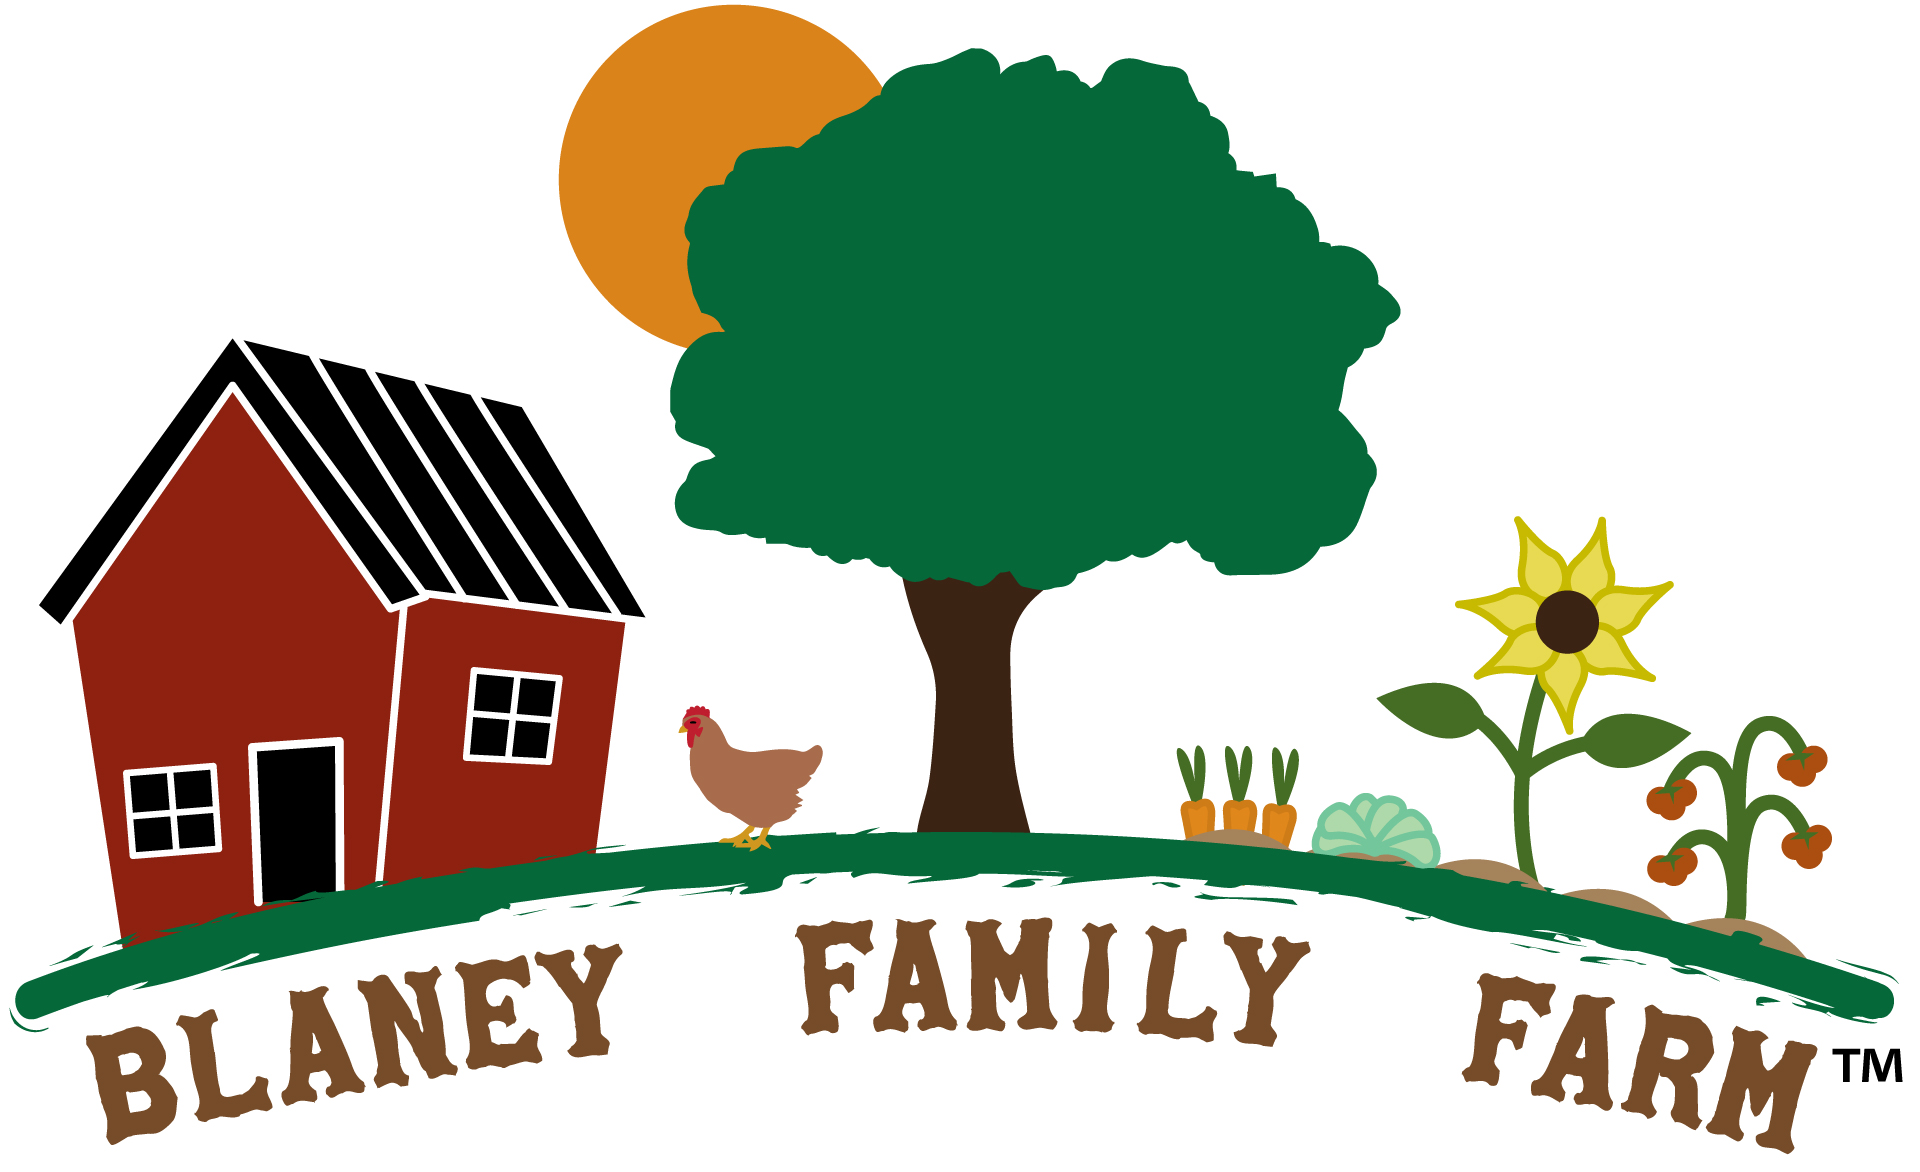 Blaney Family Farm